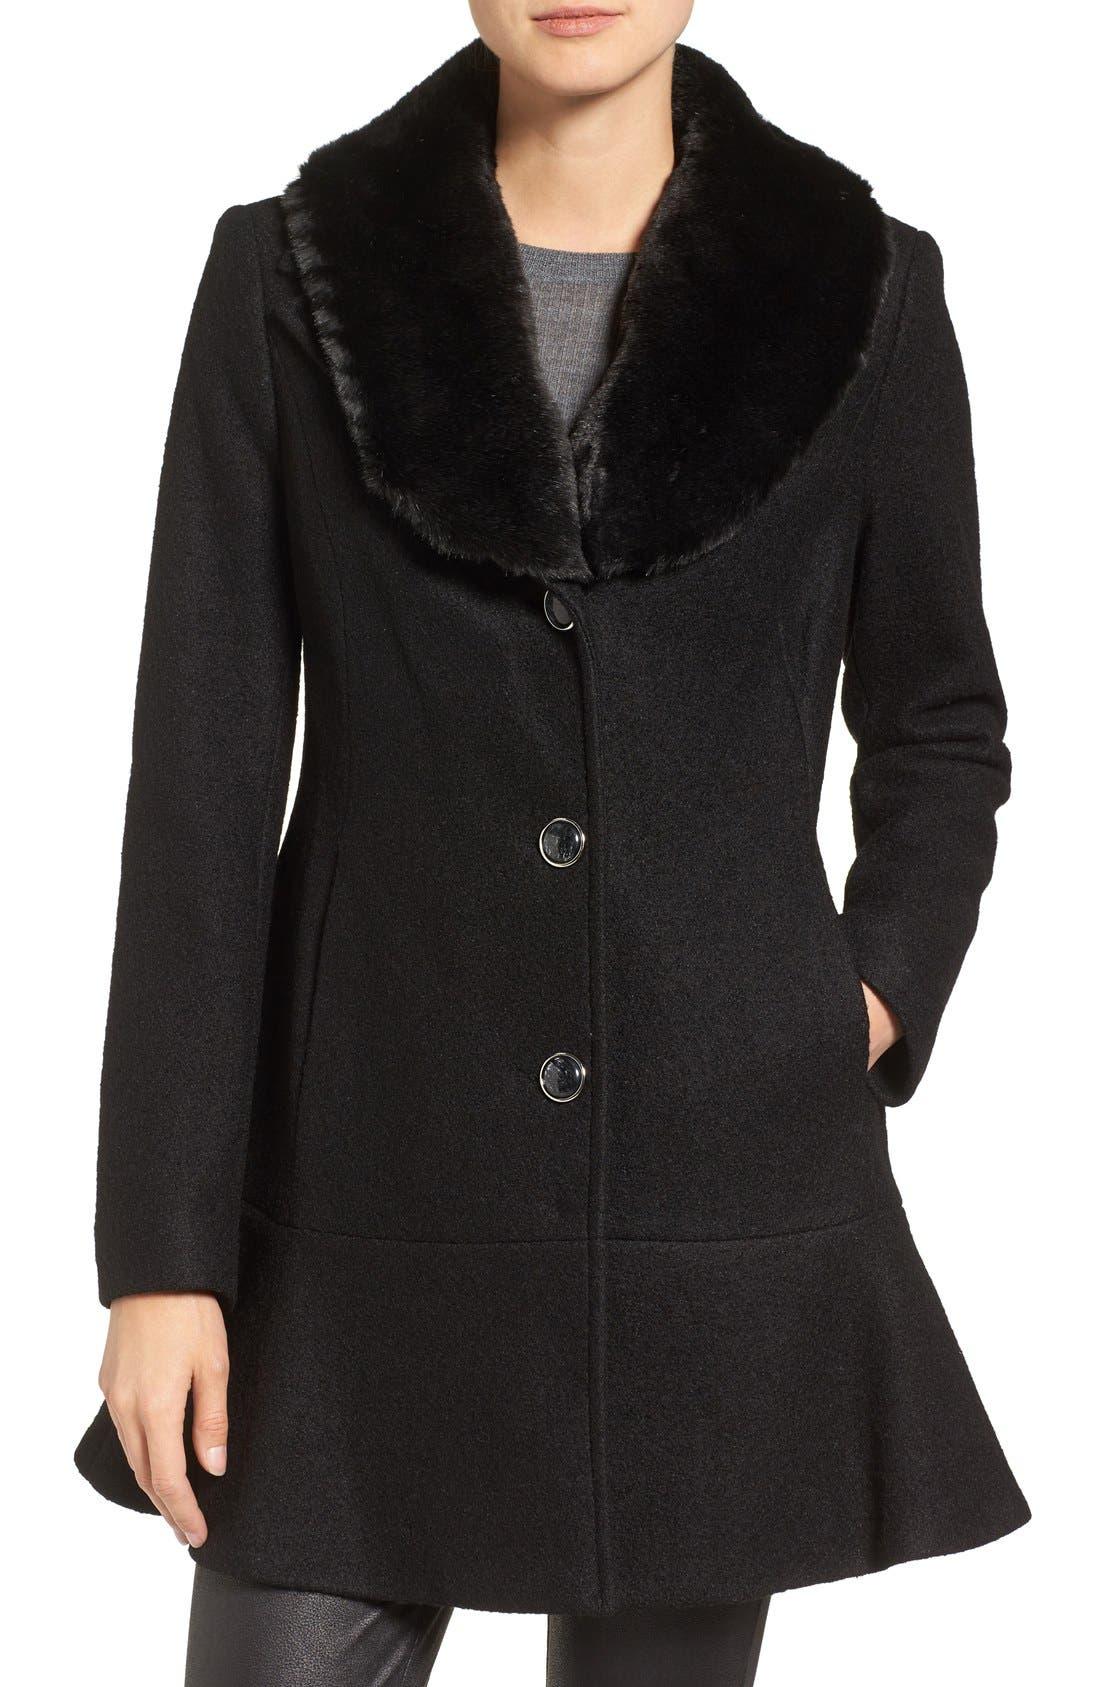 Alternate Image 1 Selected - kensie Removable Faux Fur Collar Skirted Coat